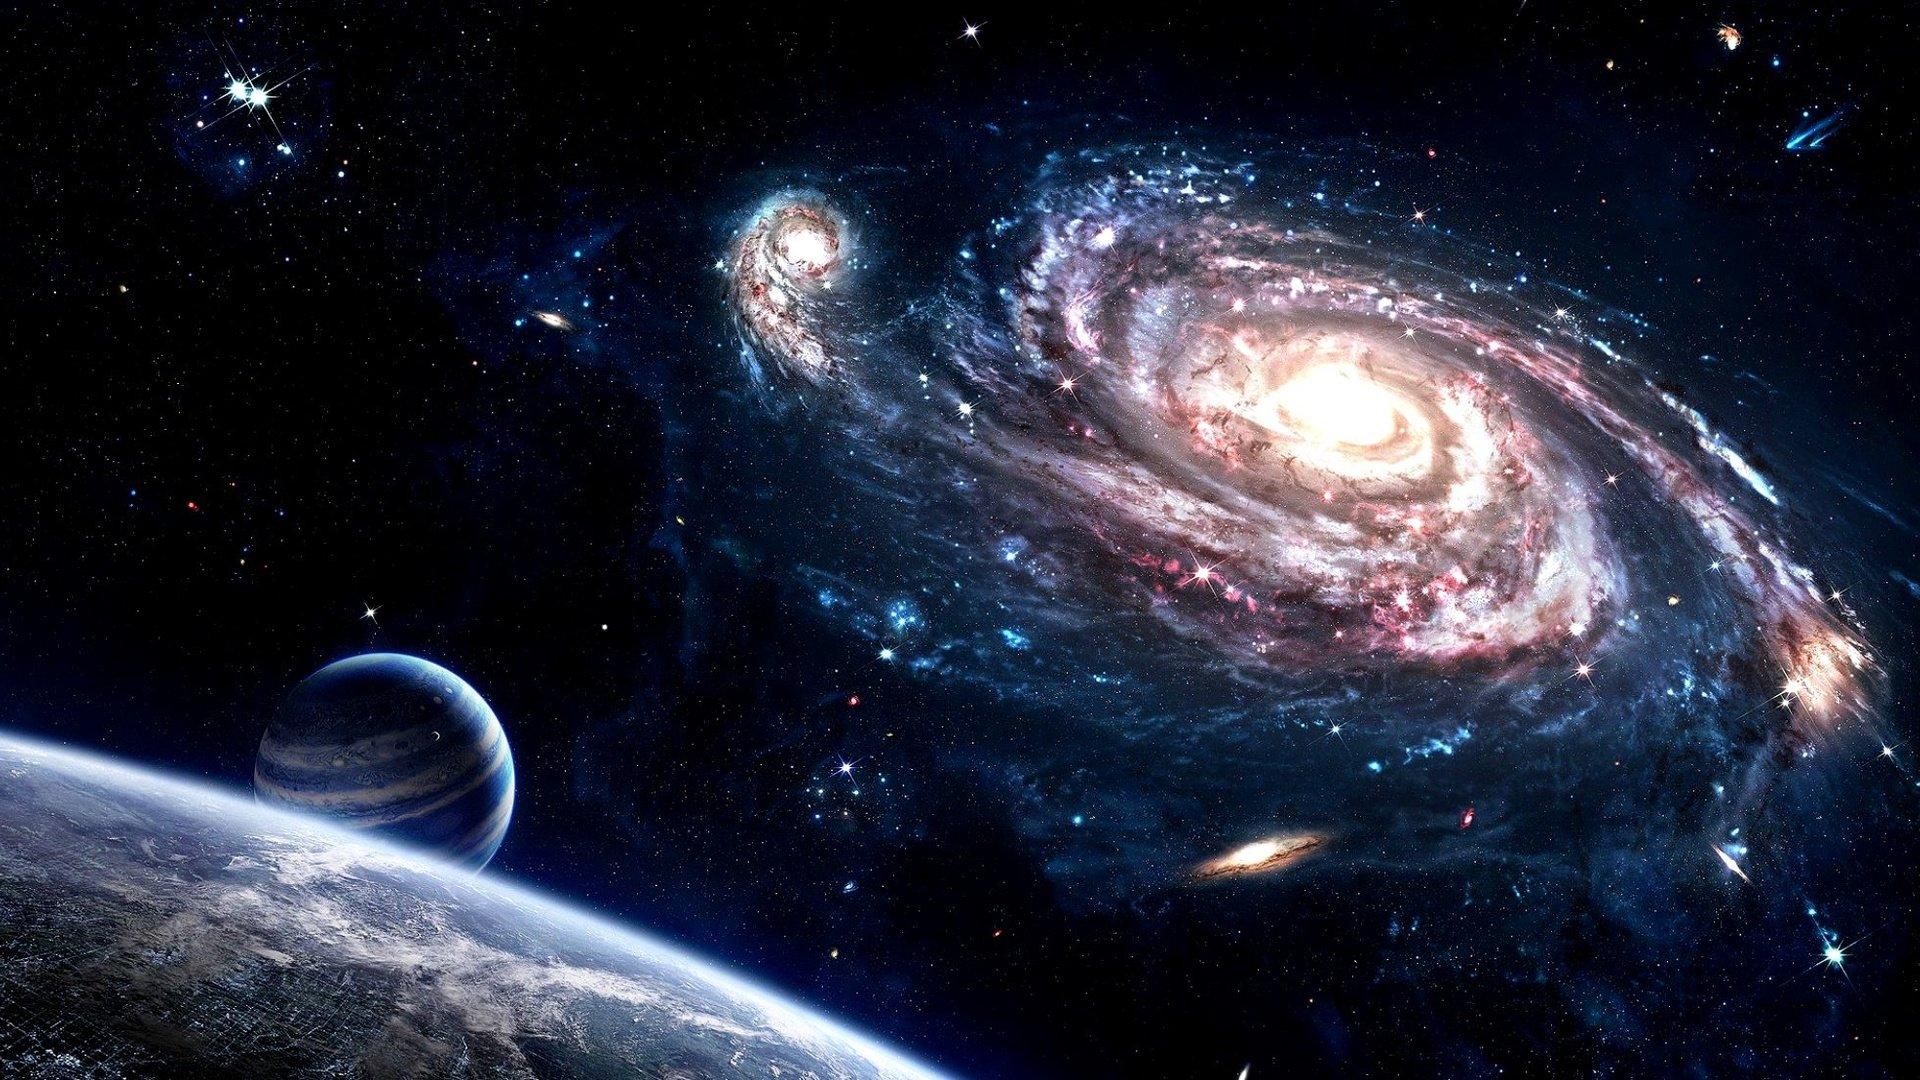 universe solar system stars and galaxies pdf - HD1920×1080